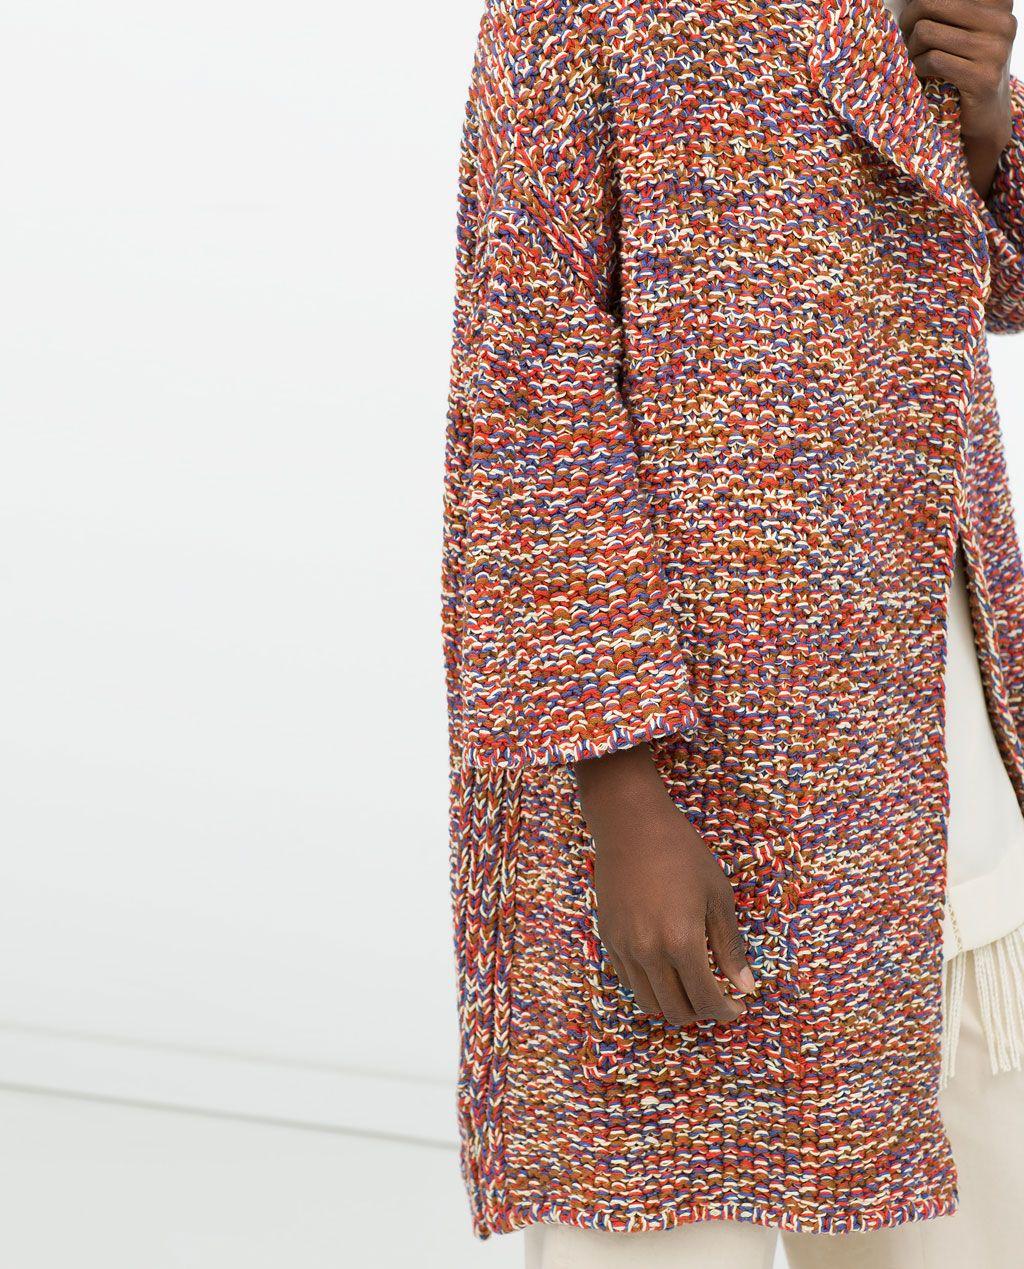 ZARA - FEMME - MANTEAU MULTICOLORE   TRICOT   Pinterest   Zara femme ... e65029c42bf5